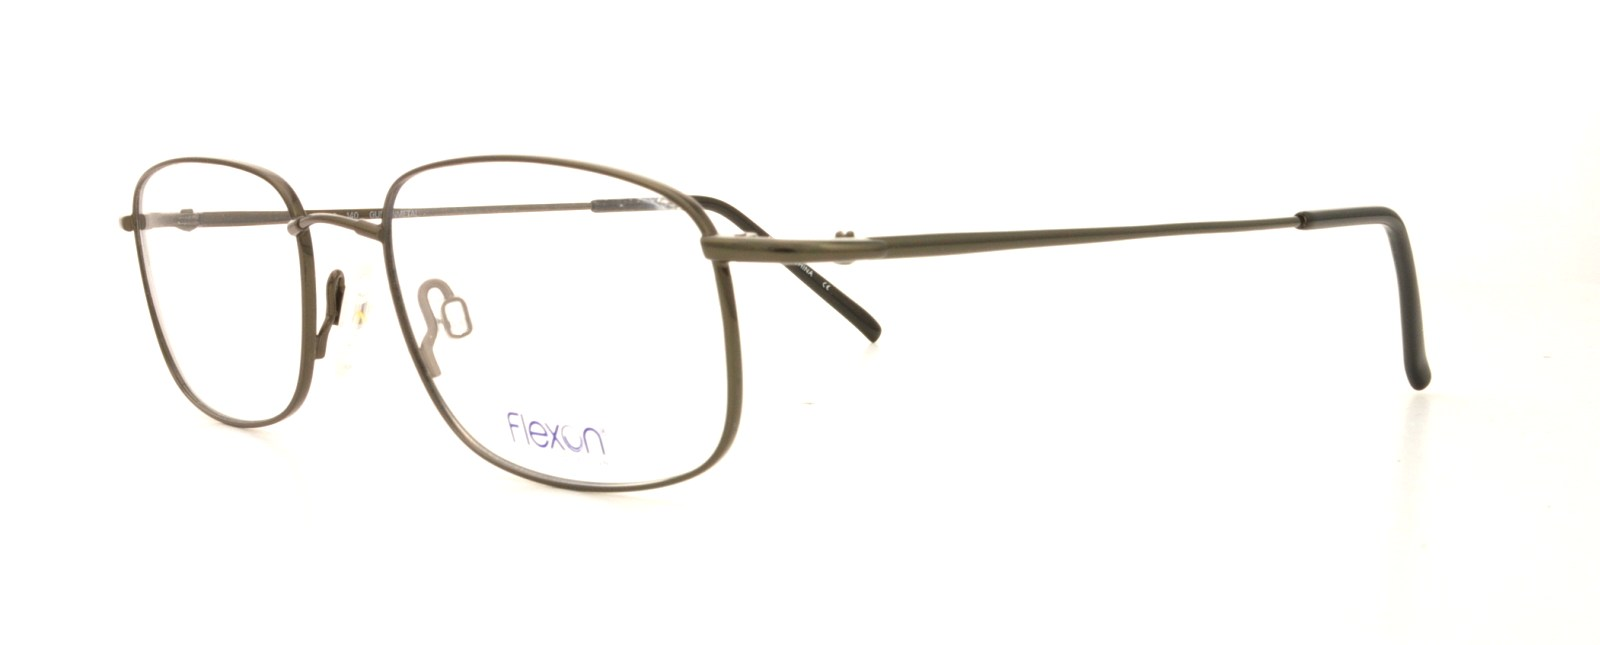 ac2751e715a Designer Frames Outlet. Flexon 610